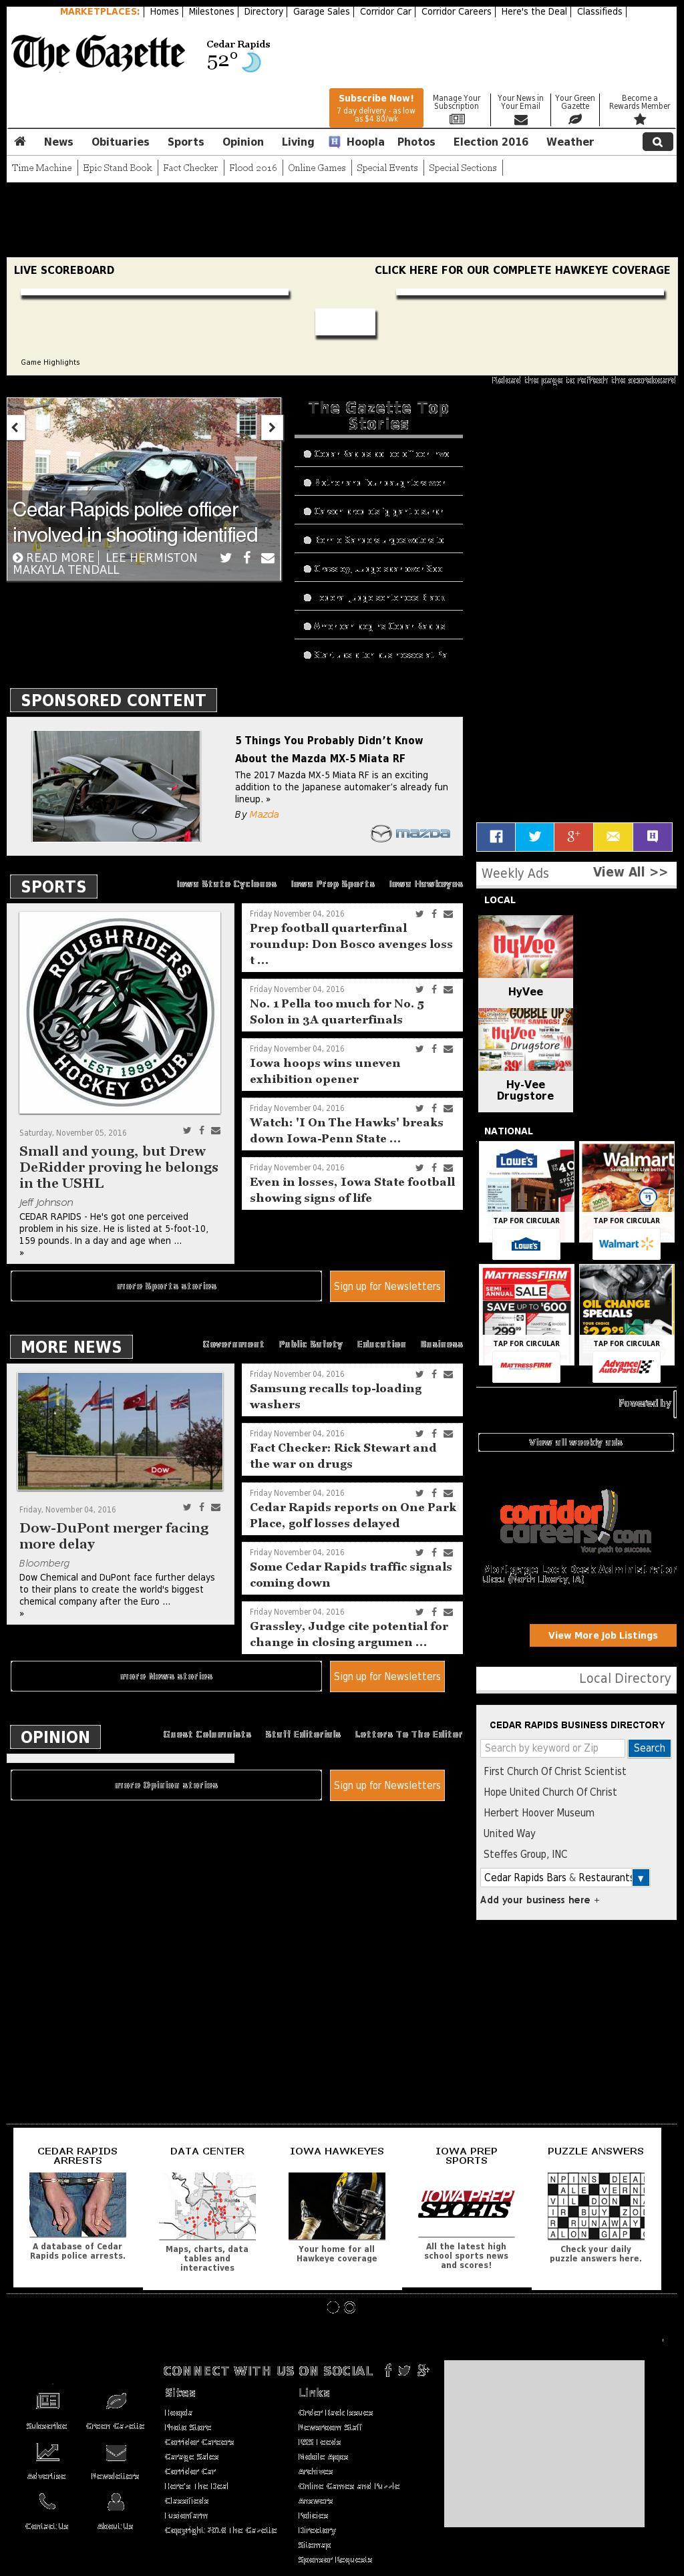 The (Cedar Rapids) Gazette at Saturday Nov. 5, 2016, 10:06 a.m. UTC